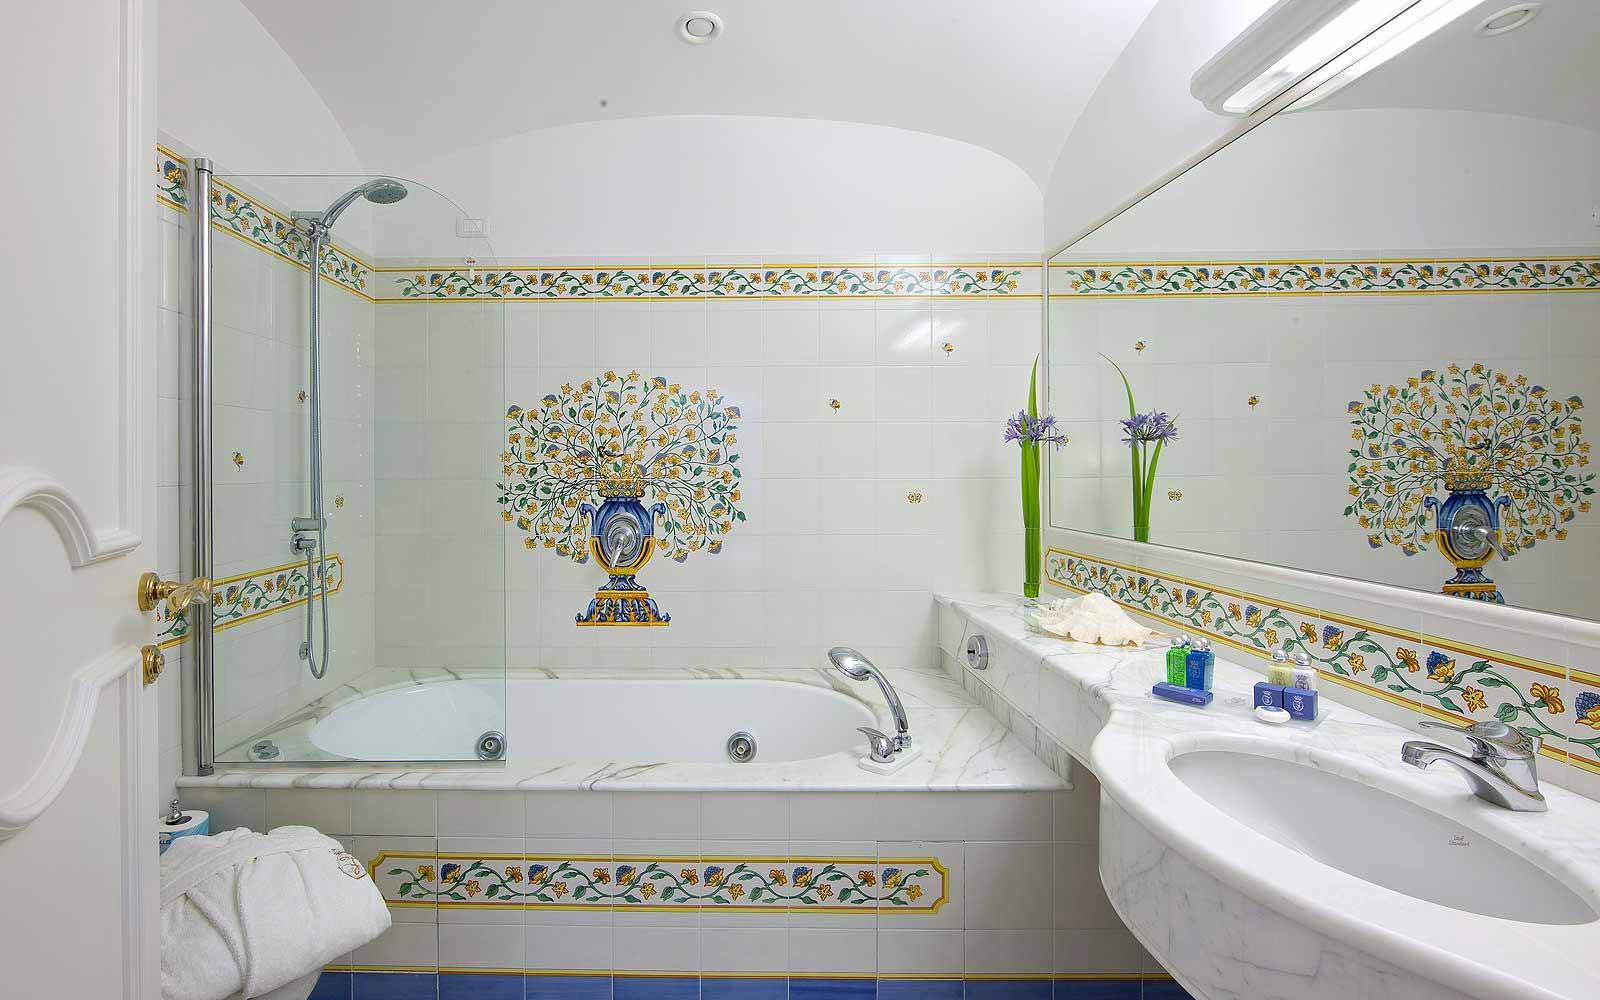 A bathroom at the Grand Hotel La Favorita